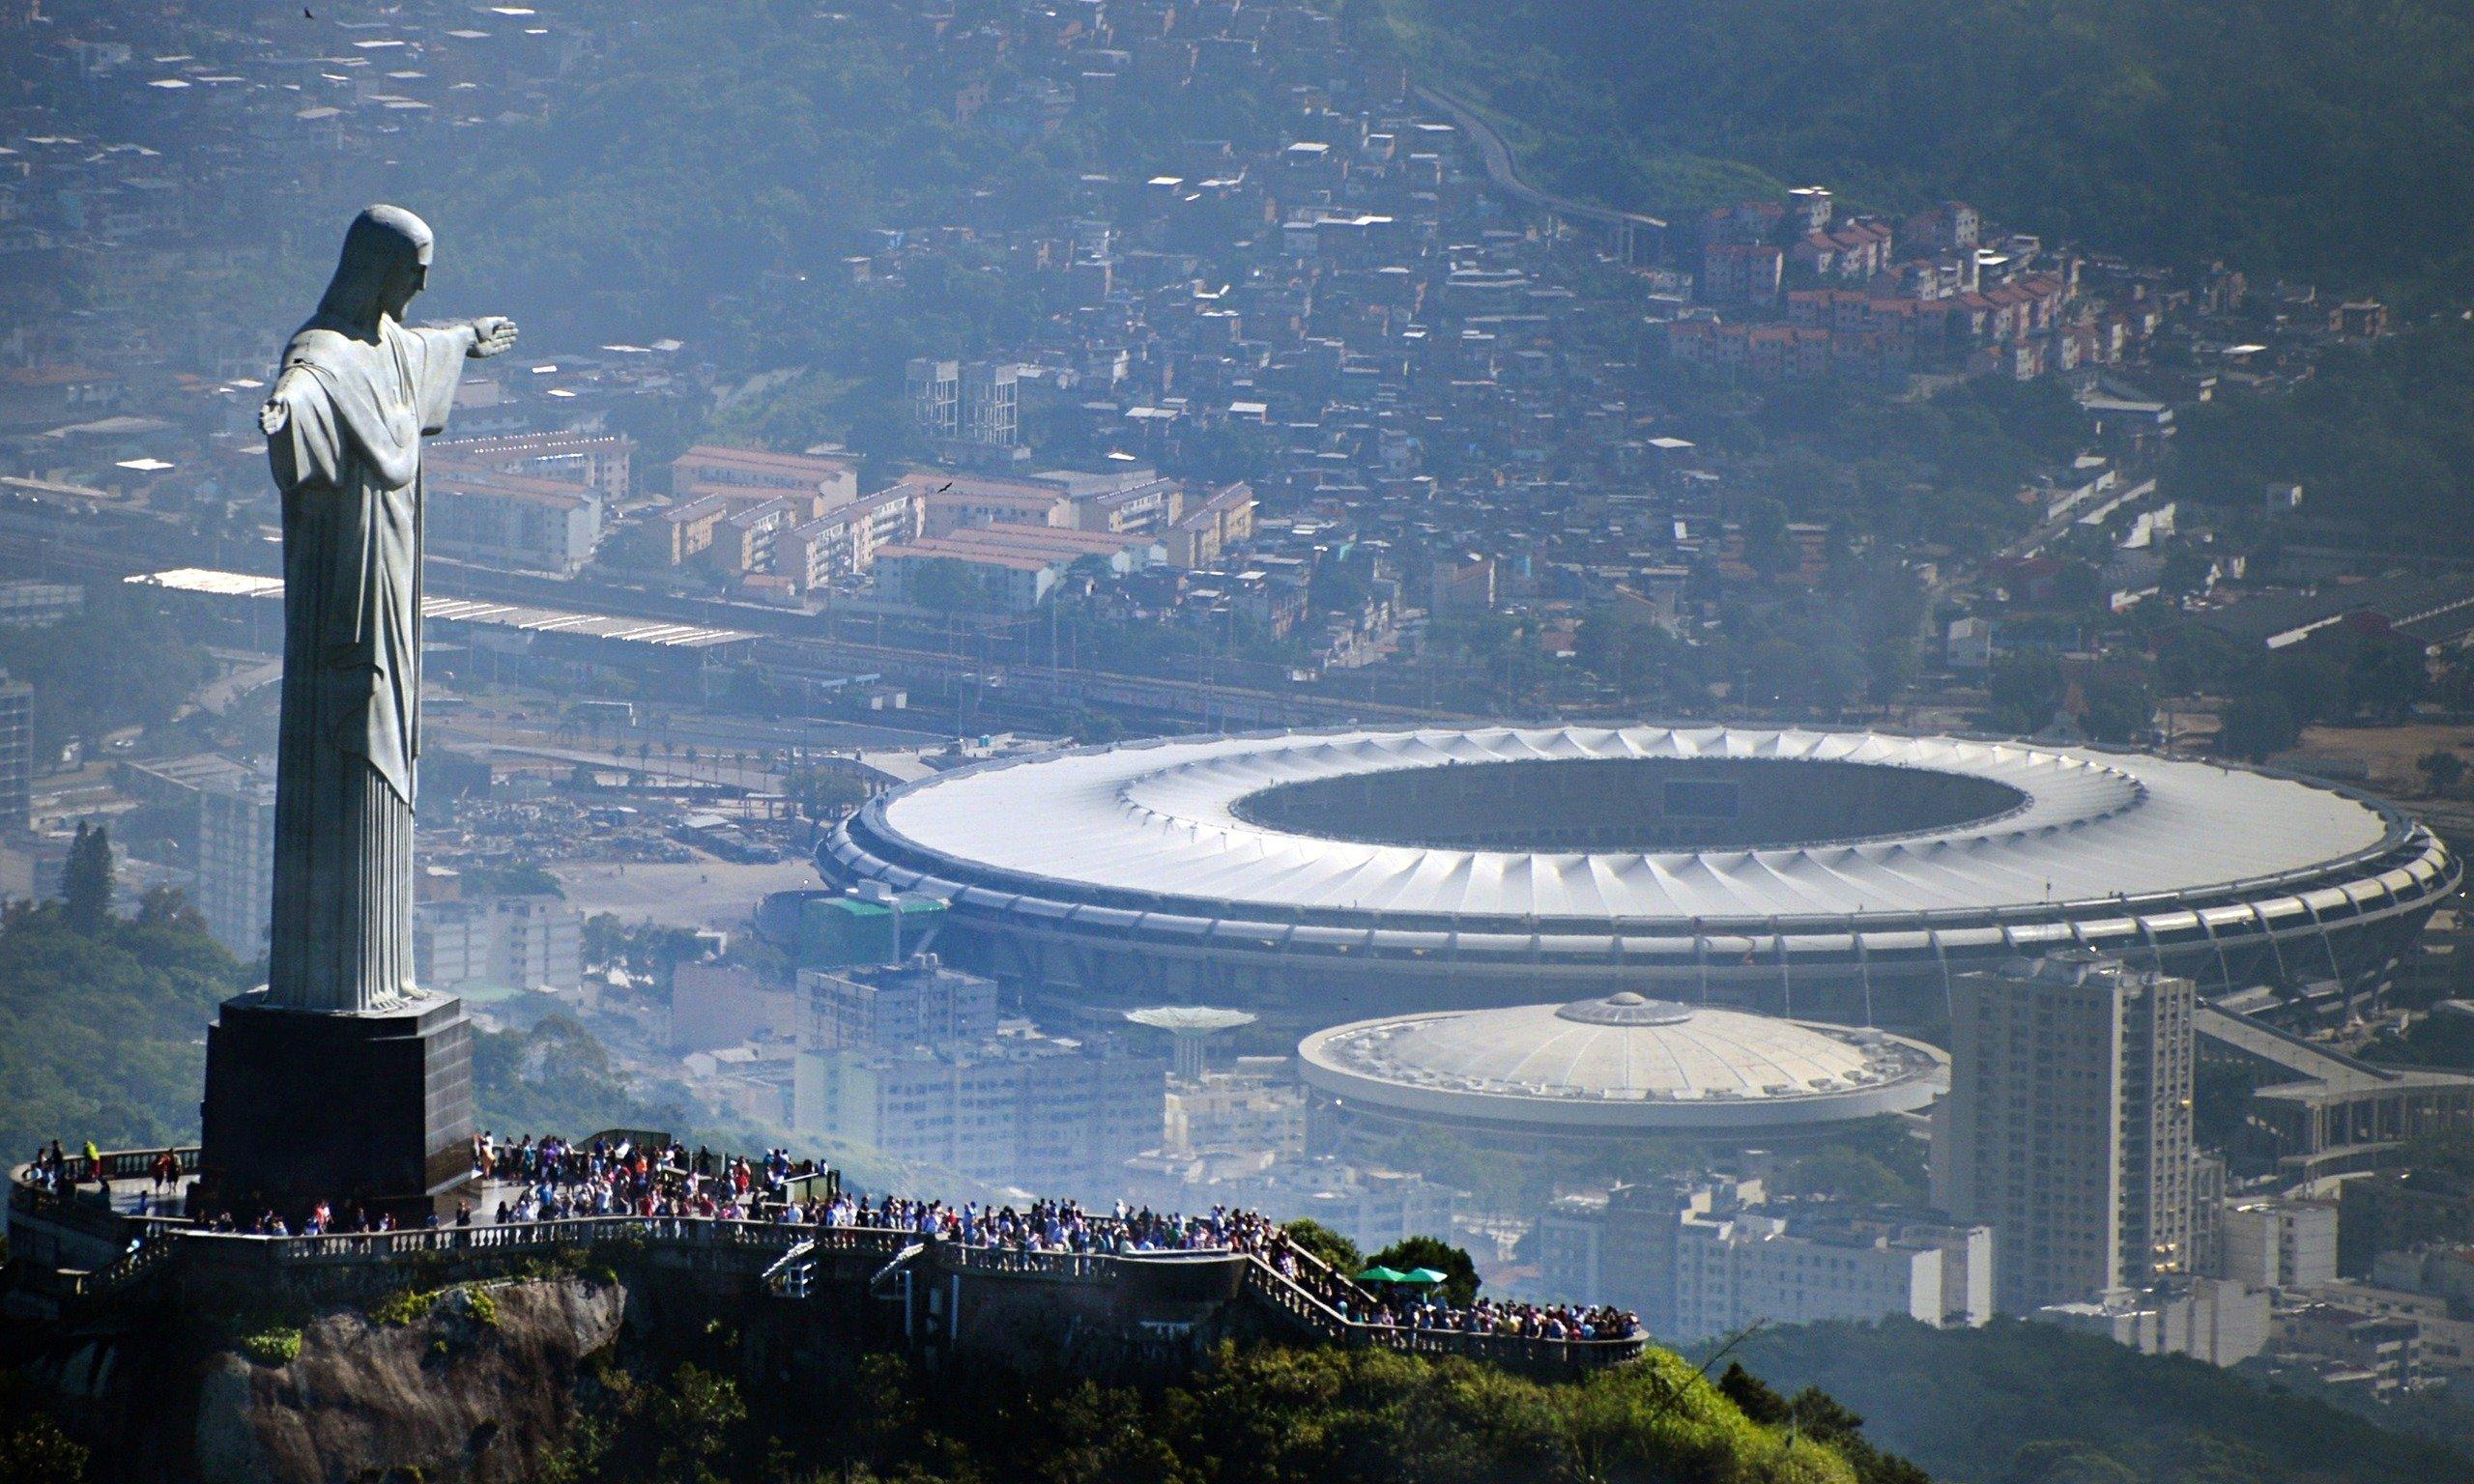 The Christ the Redeemer statue overlooking Rio and the Maracana stadium